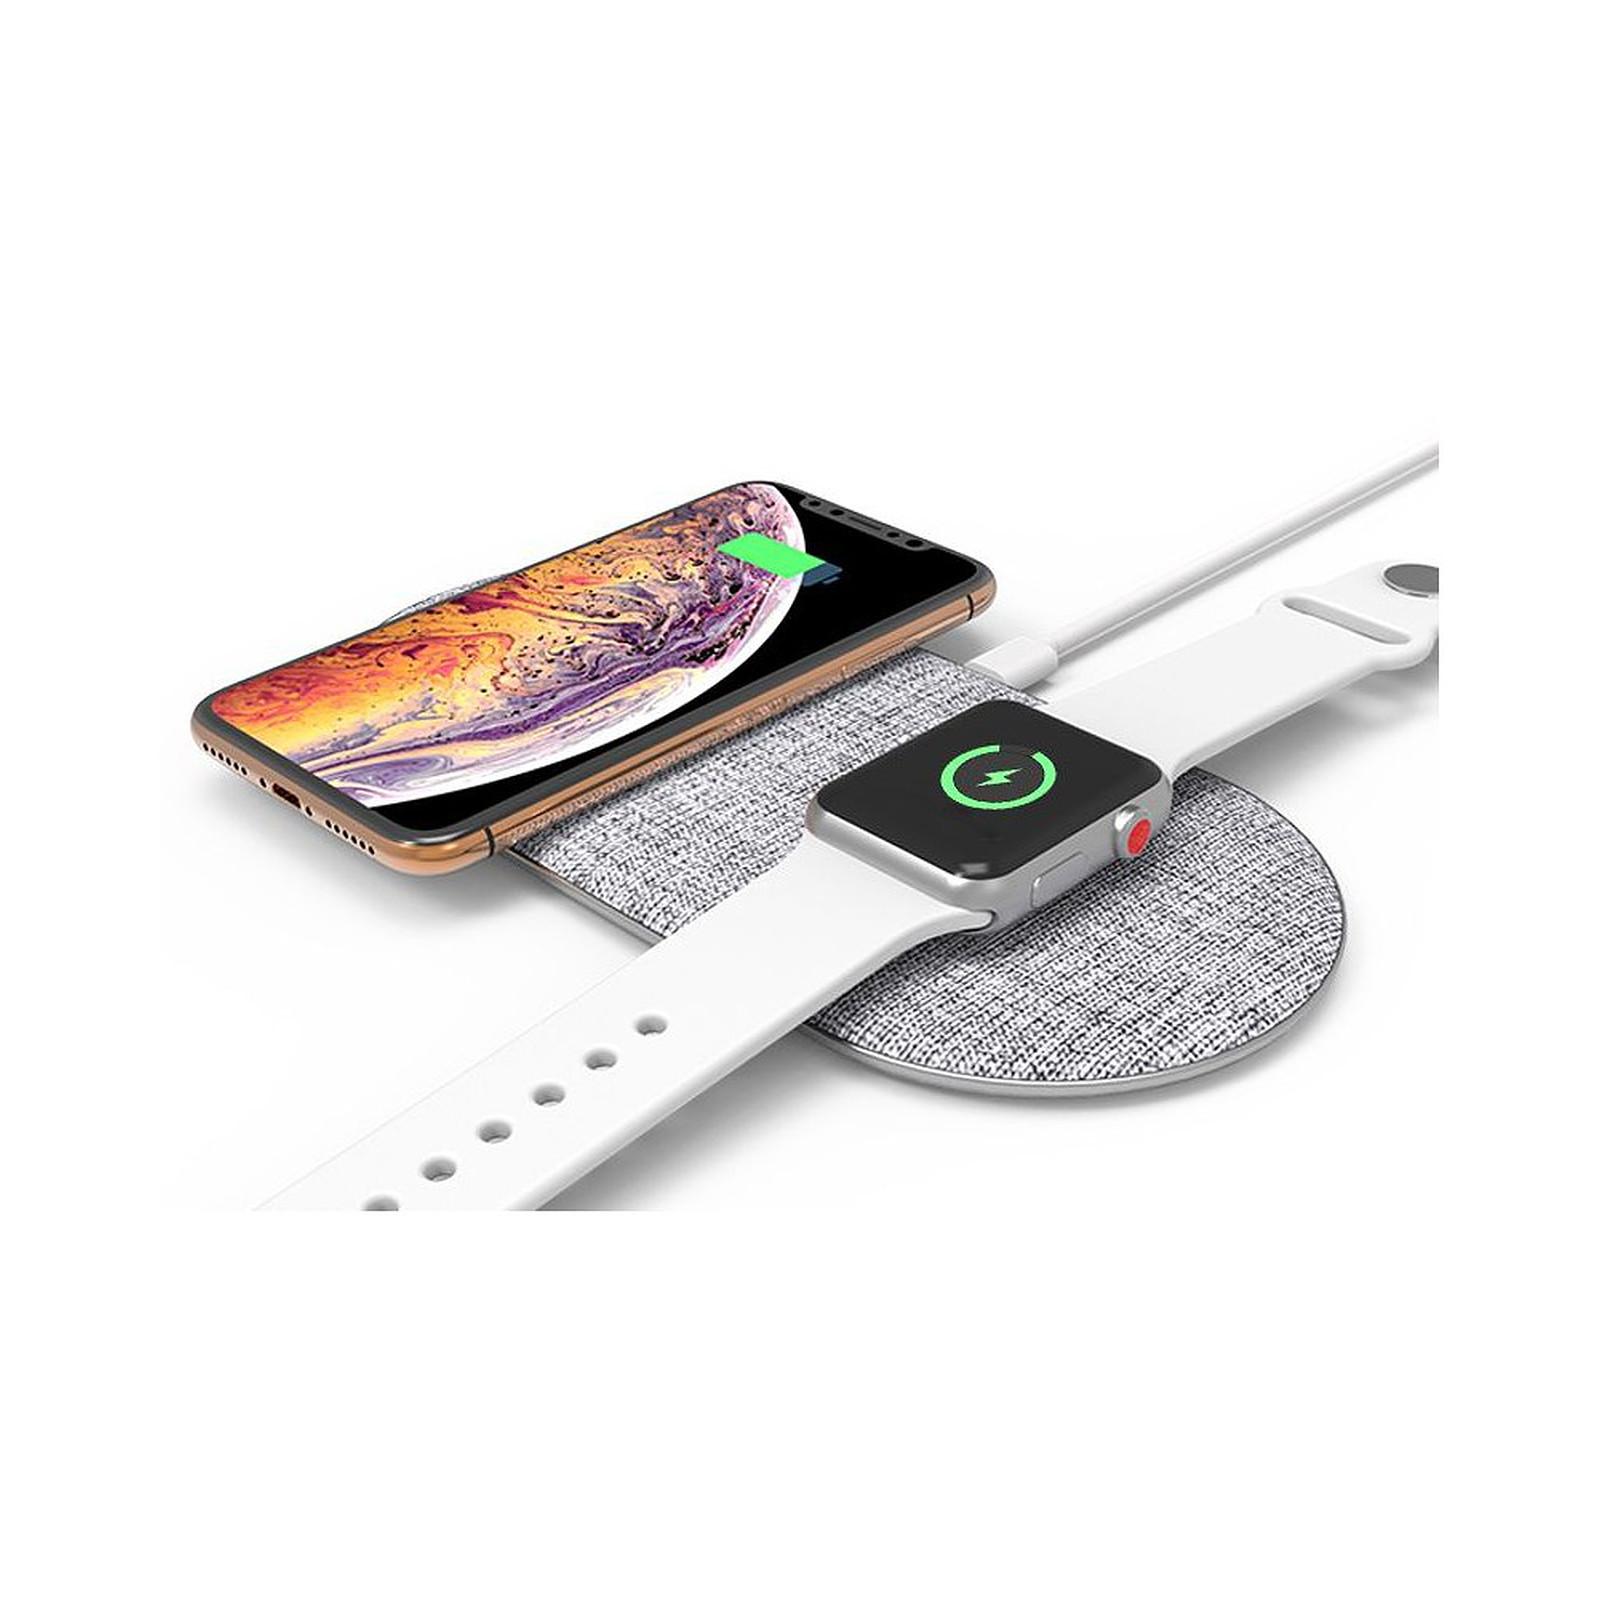 Cellys Socle de charge induction IPhone 8 / 9 / X/ Xr et iWatch Blanc